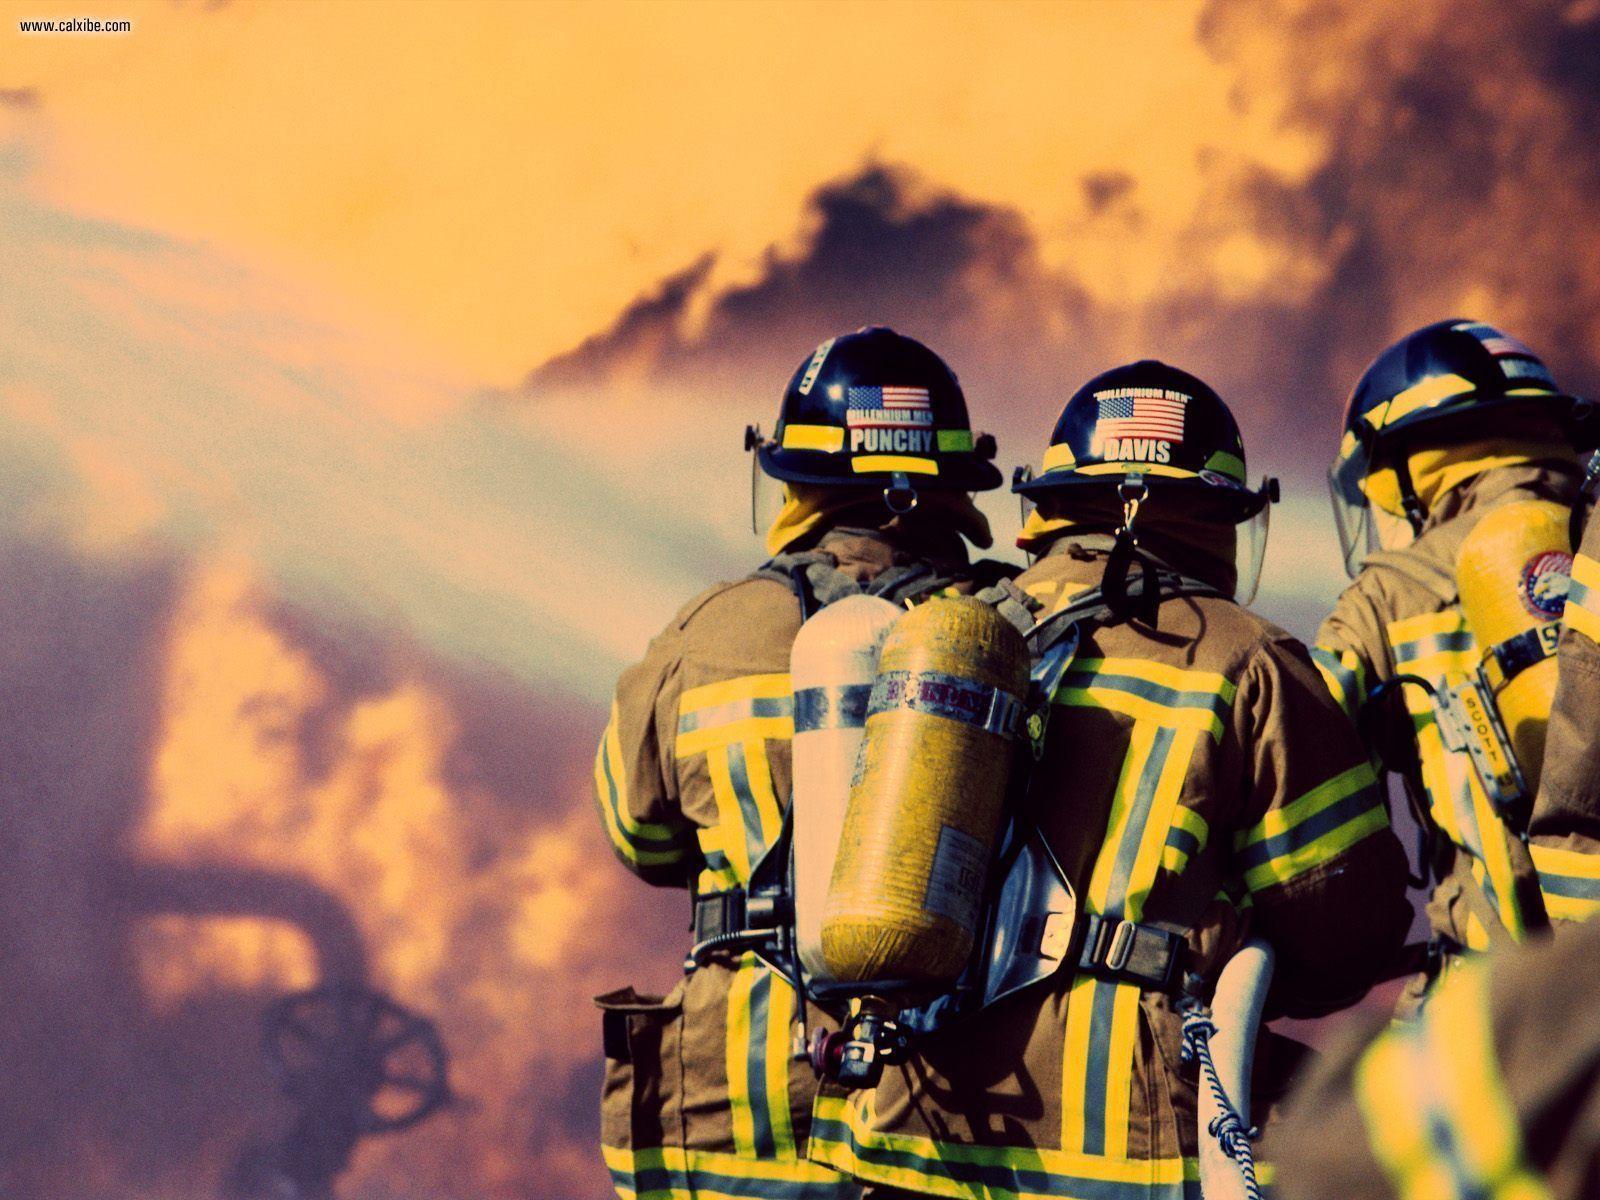 Hd Firefighter Wallpaper For Computer 5418